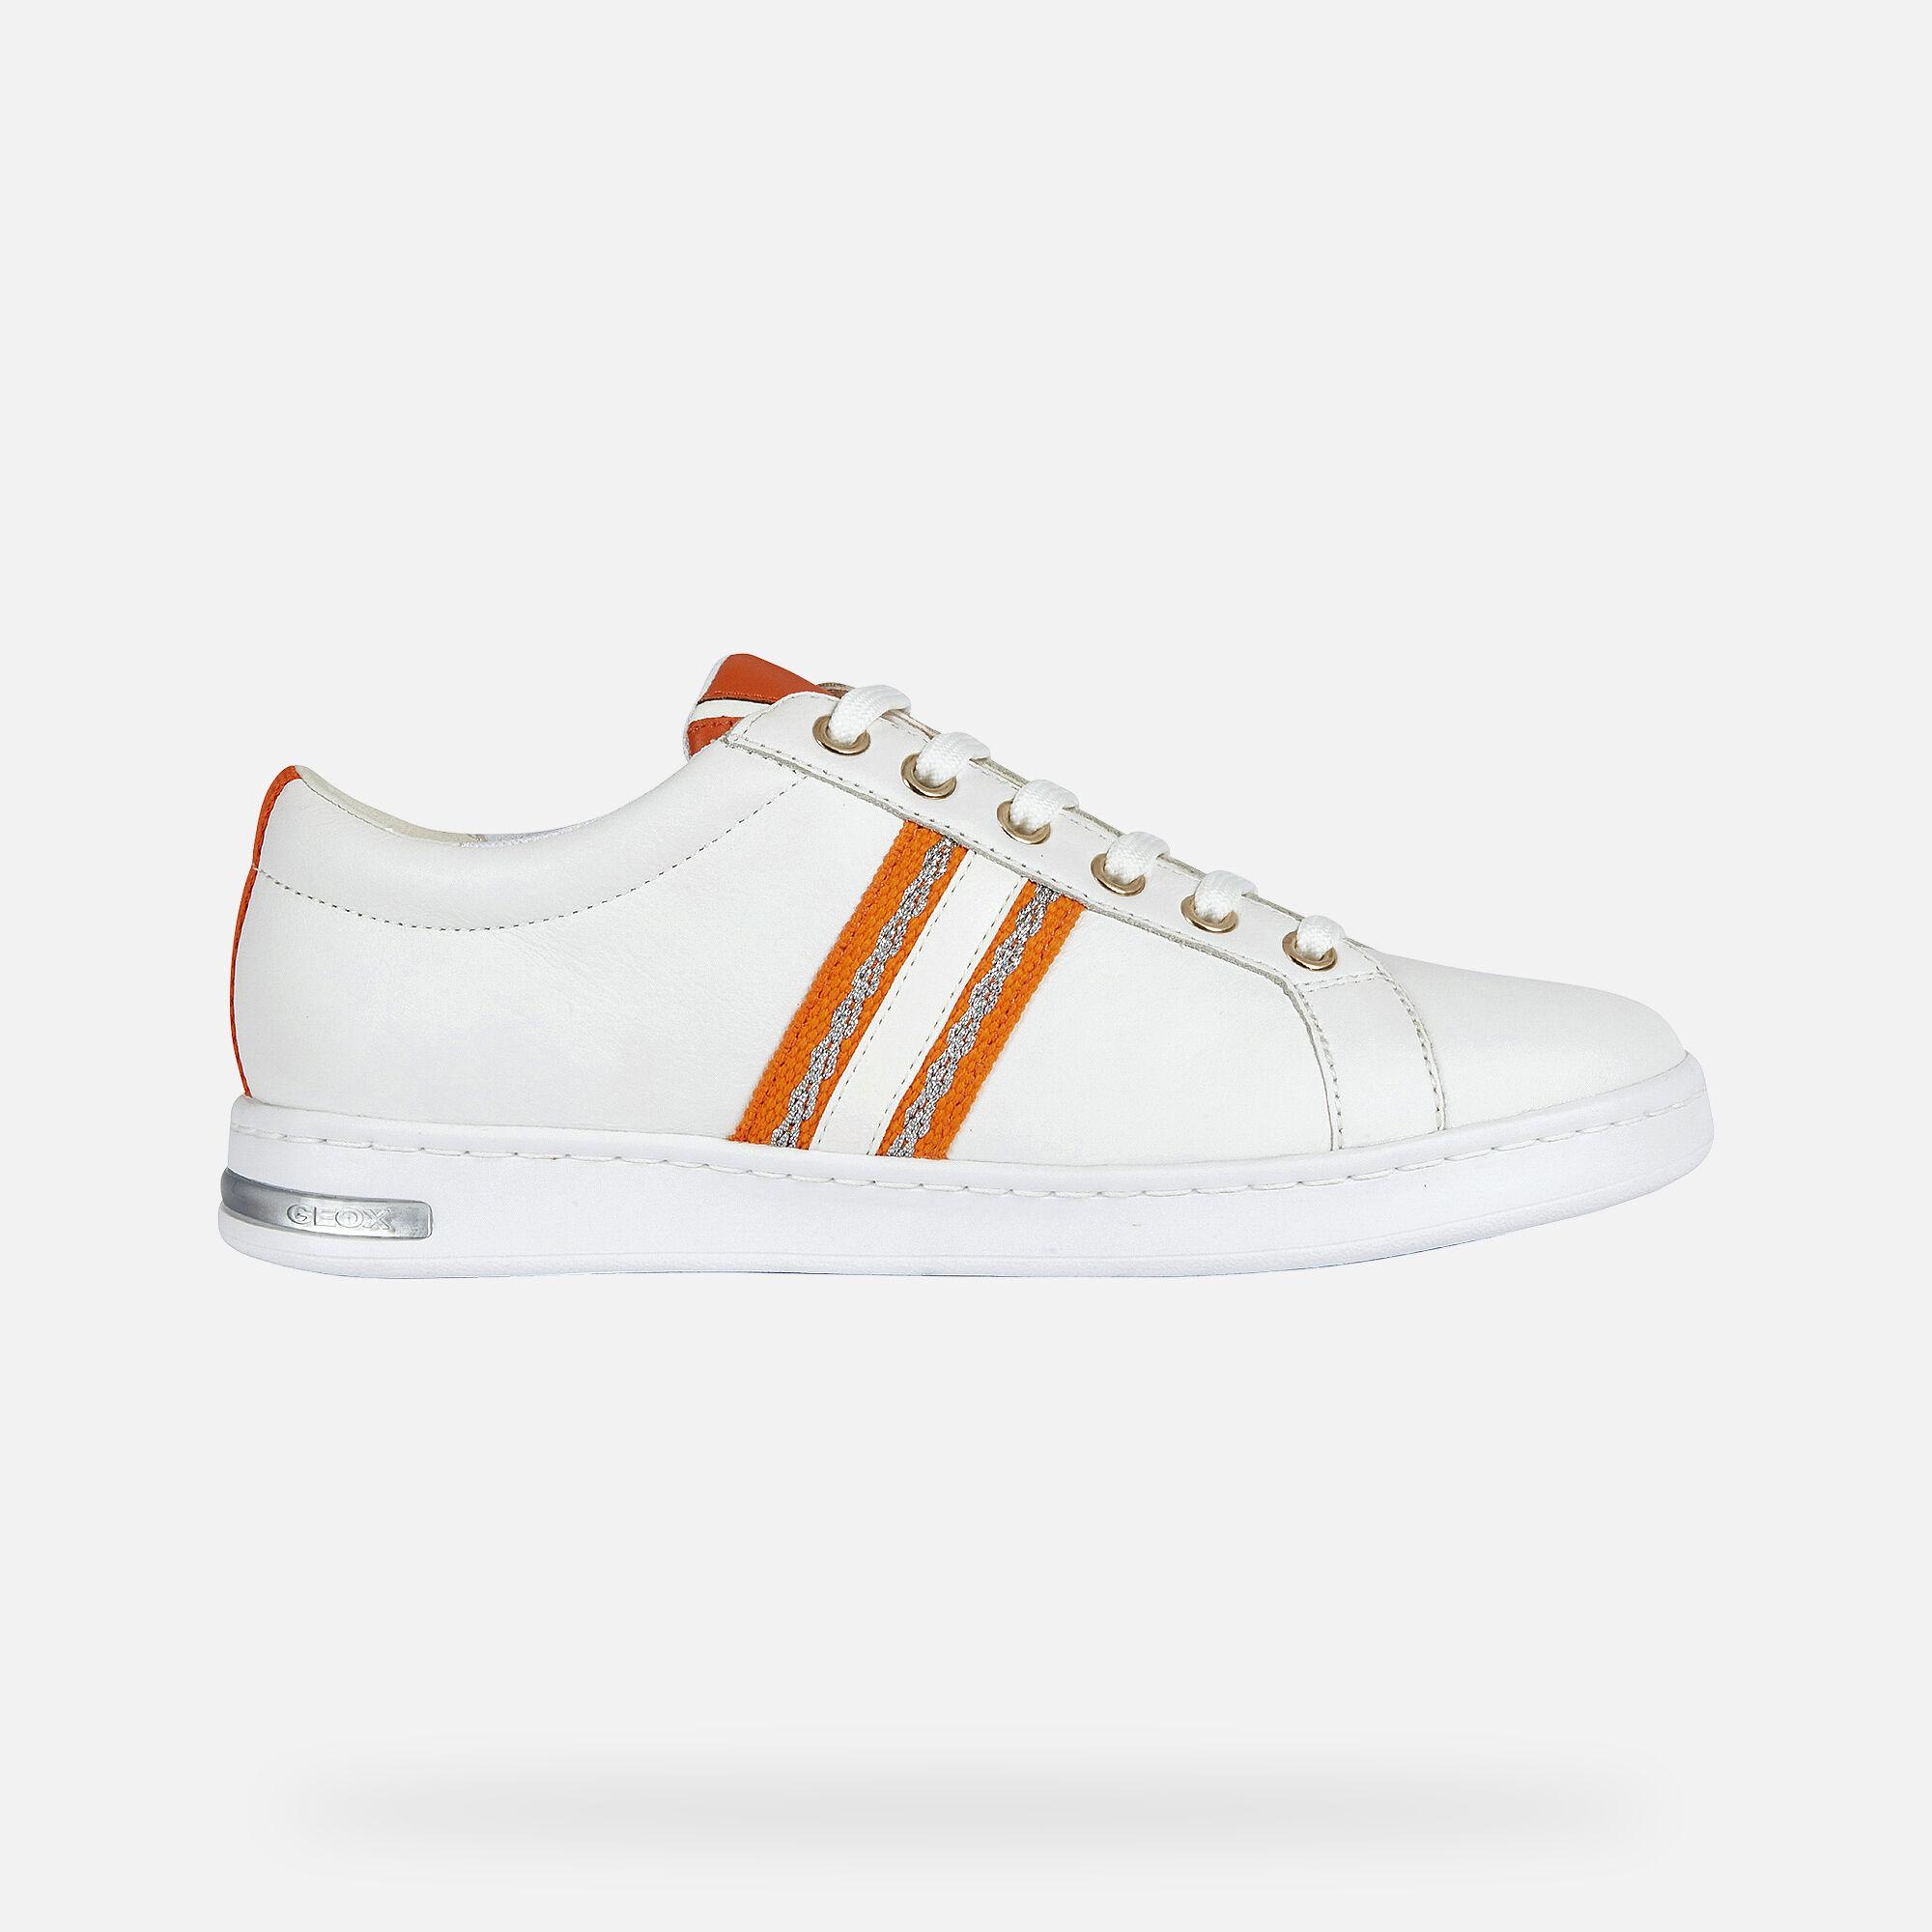 Geox JAYSEN Woman: White Sneakers